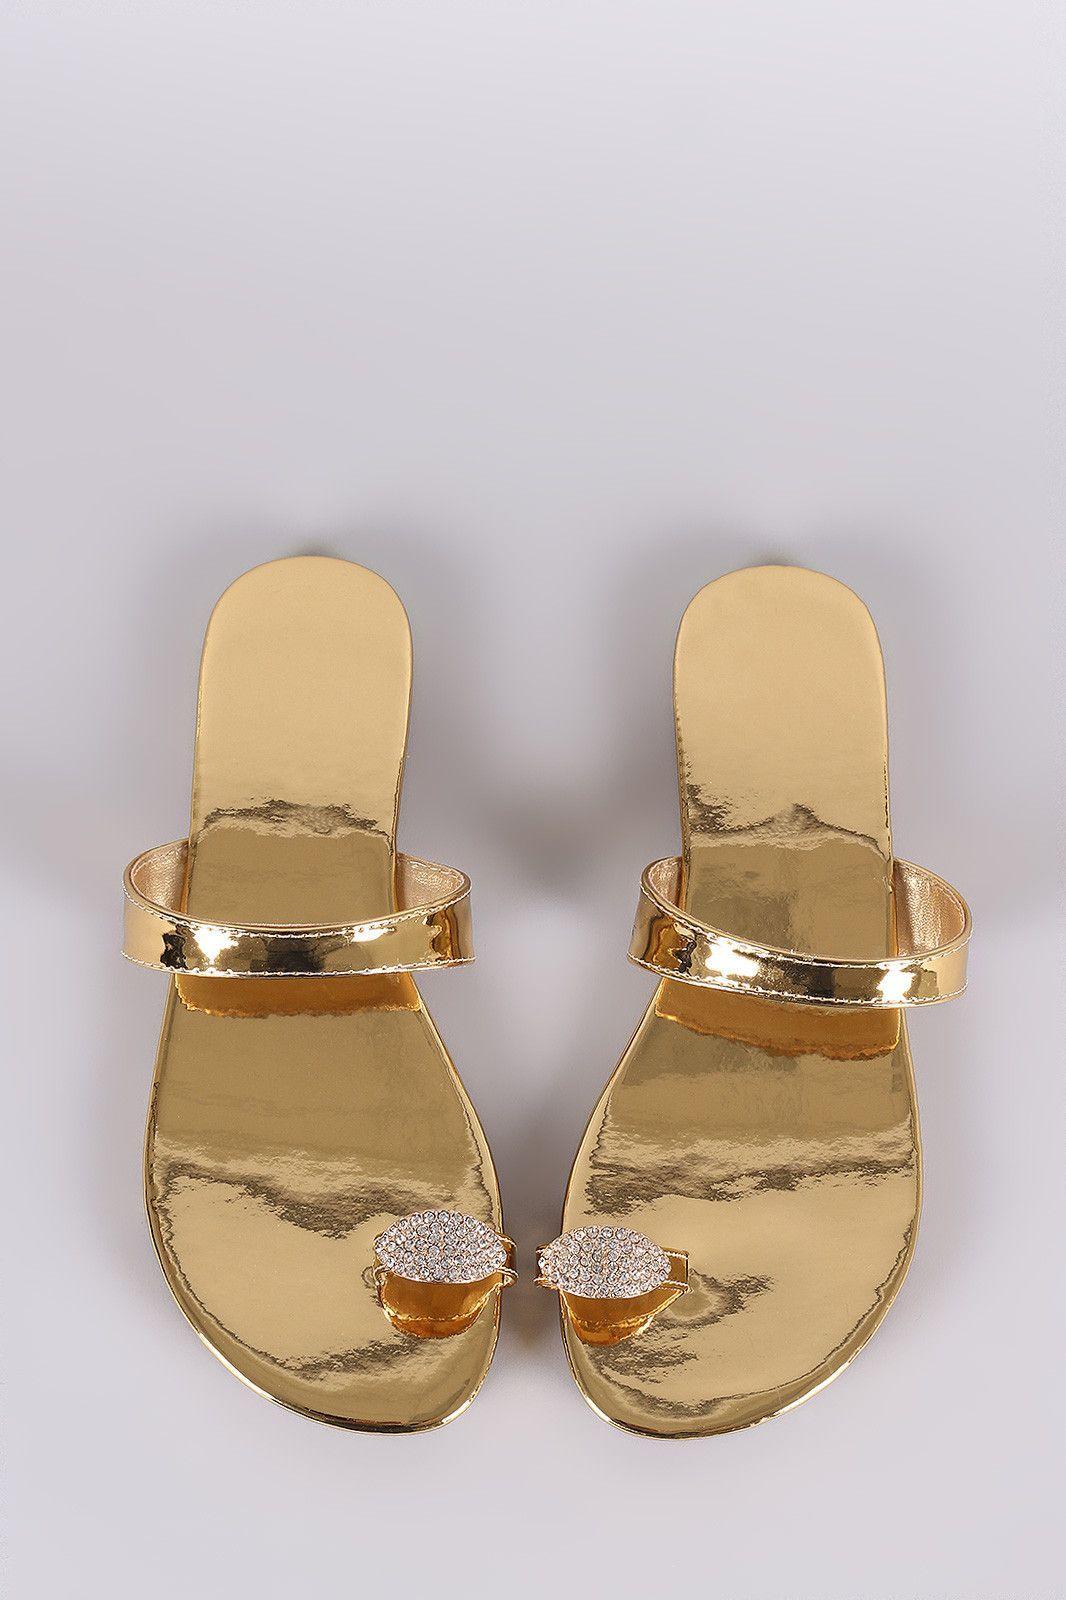 6615ac2cd35f Liliana Jewel Accent Toe Ring Slip On Patent Flat Sandal